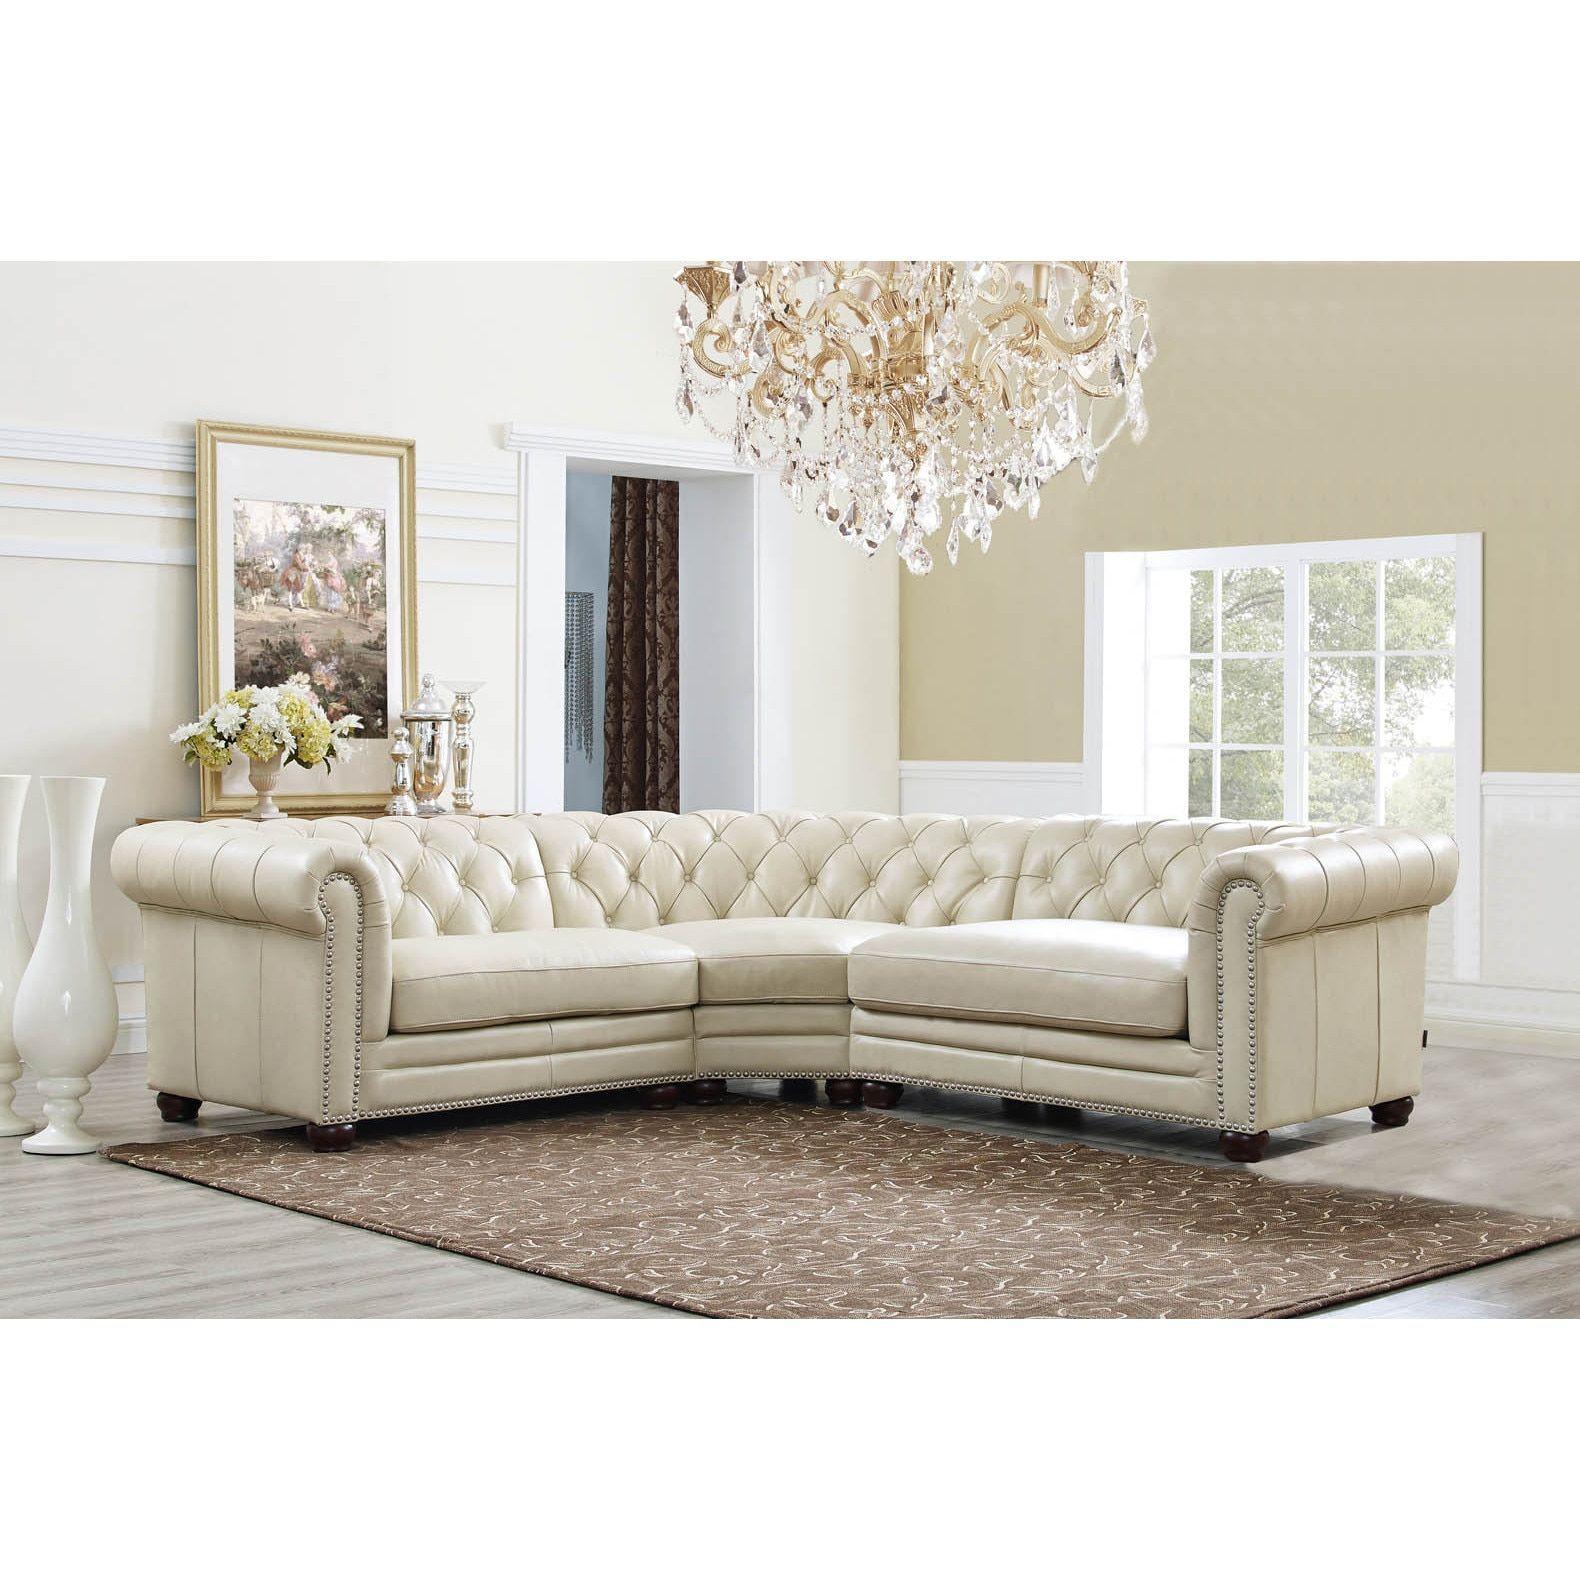 Hydeline Nicholson Top Grain Leather Button Tufted Nailhead Trim Sectional Sofa 3 Pieces Sectional Sofa Sectional Sofa Couch White Sectional Sofa